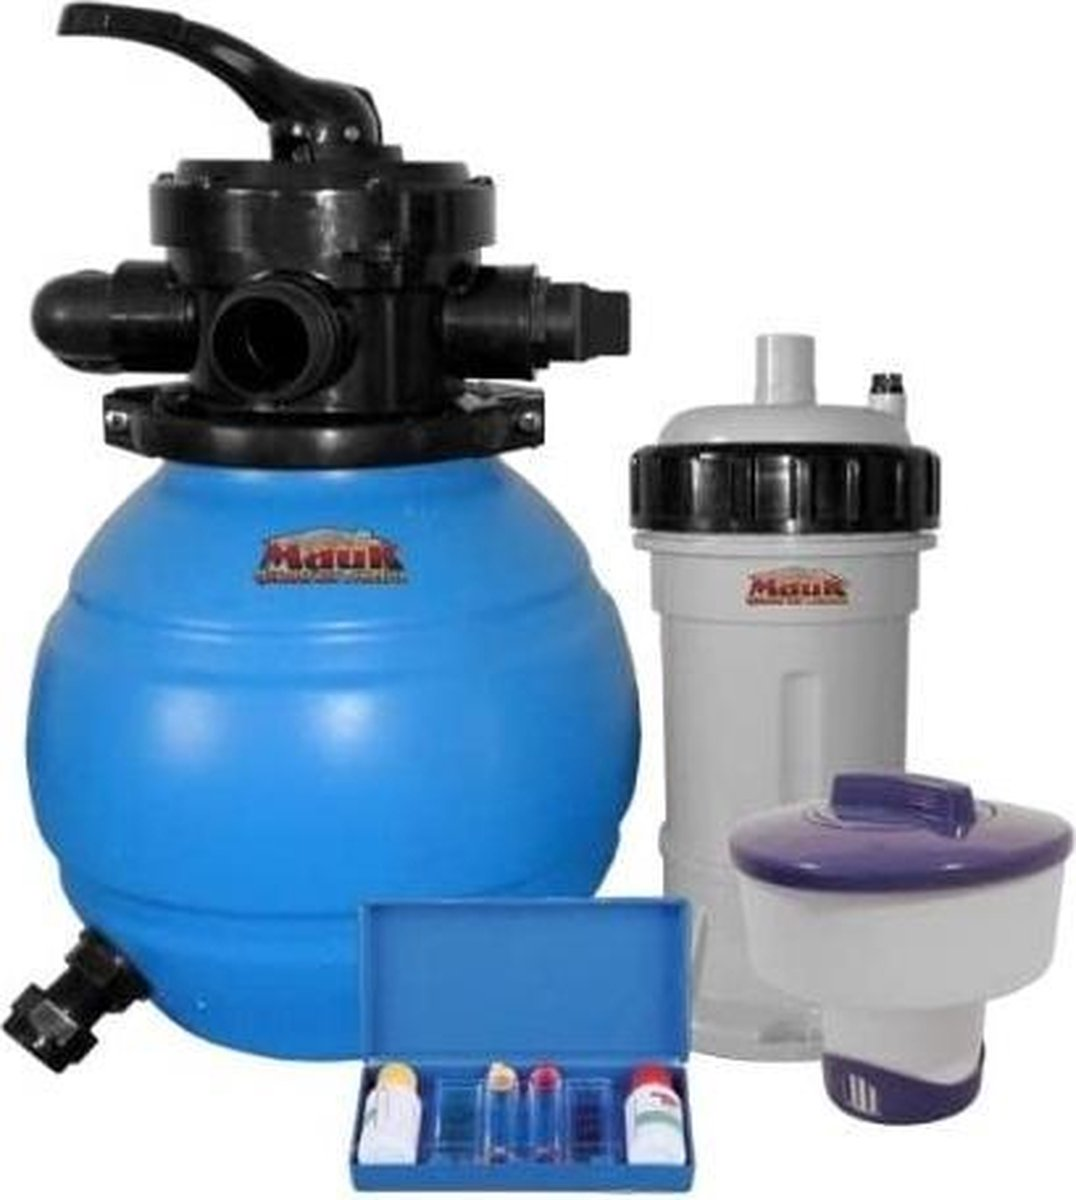 zwembad filter-mak 1601 zandfiltersysteem 90 w met chloordispenser en testkit, 12 l - (WK 02123)